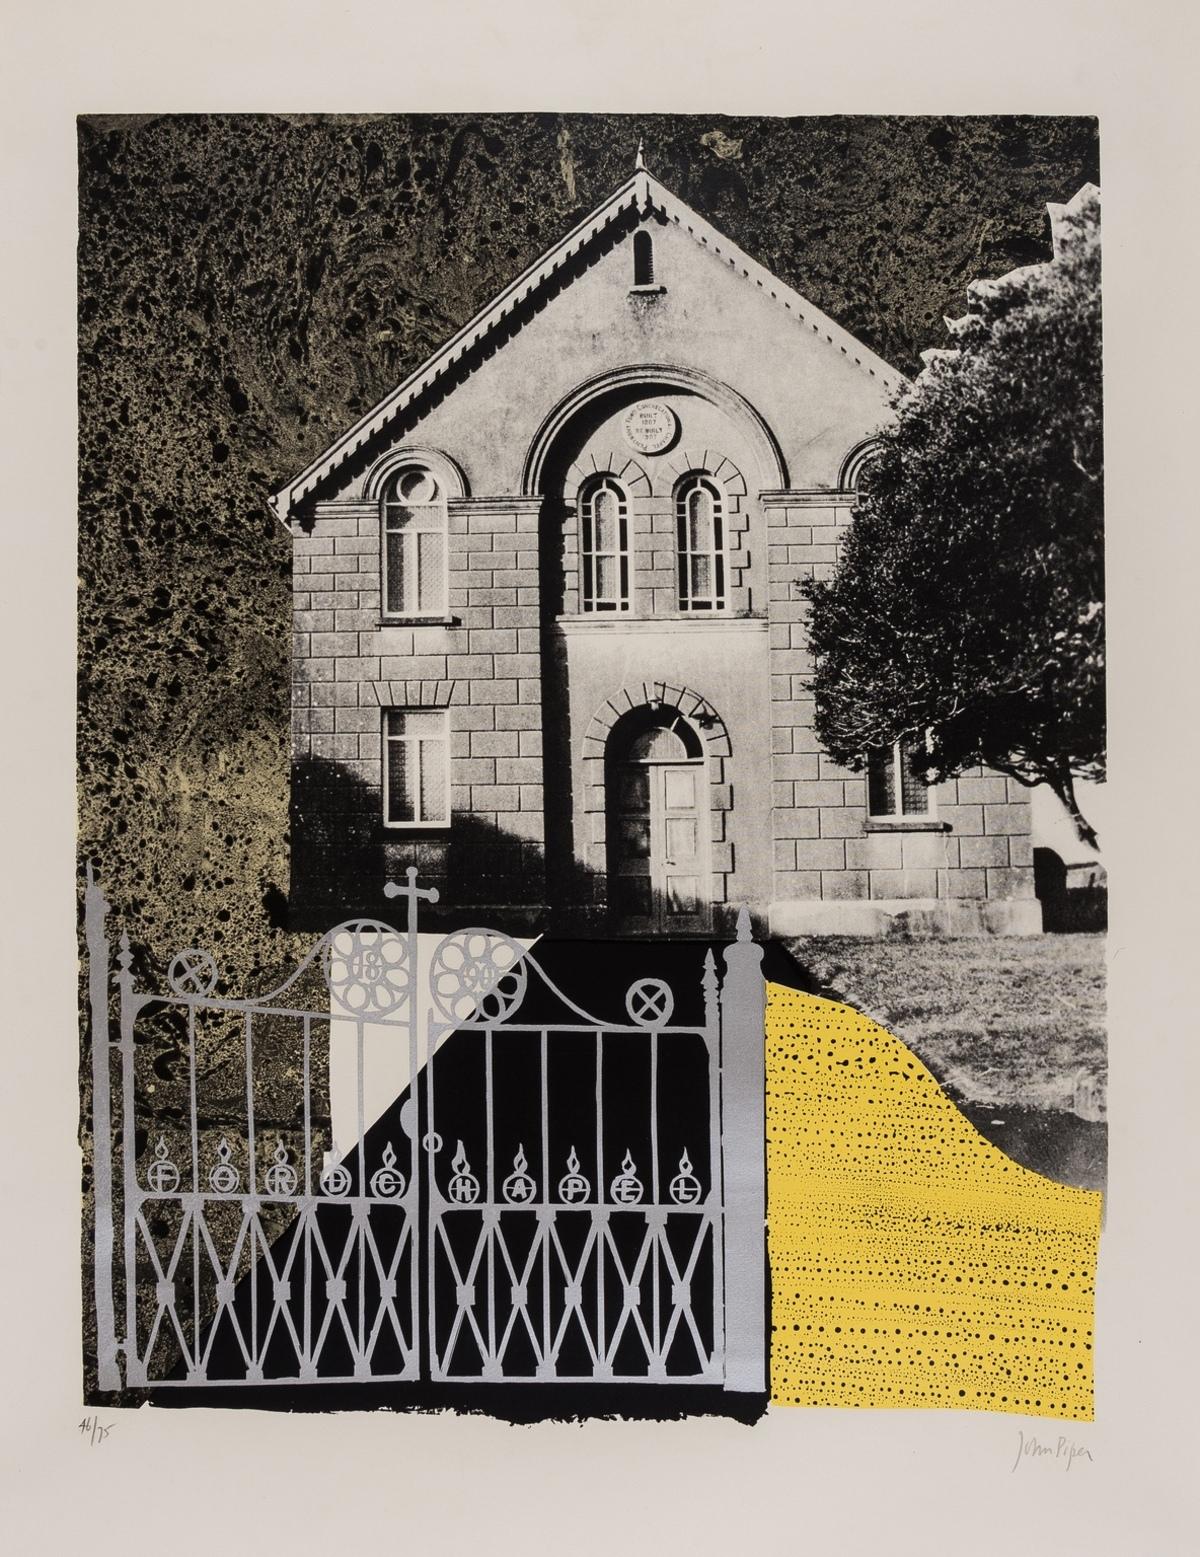 John Piper (1903-1992) Penybont Ford Congregational Church (Levinson 176)